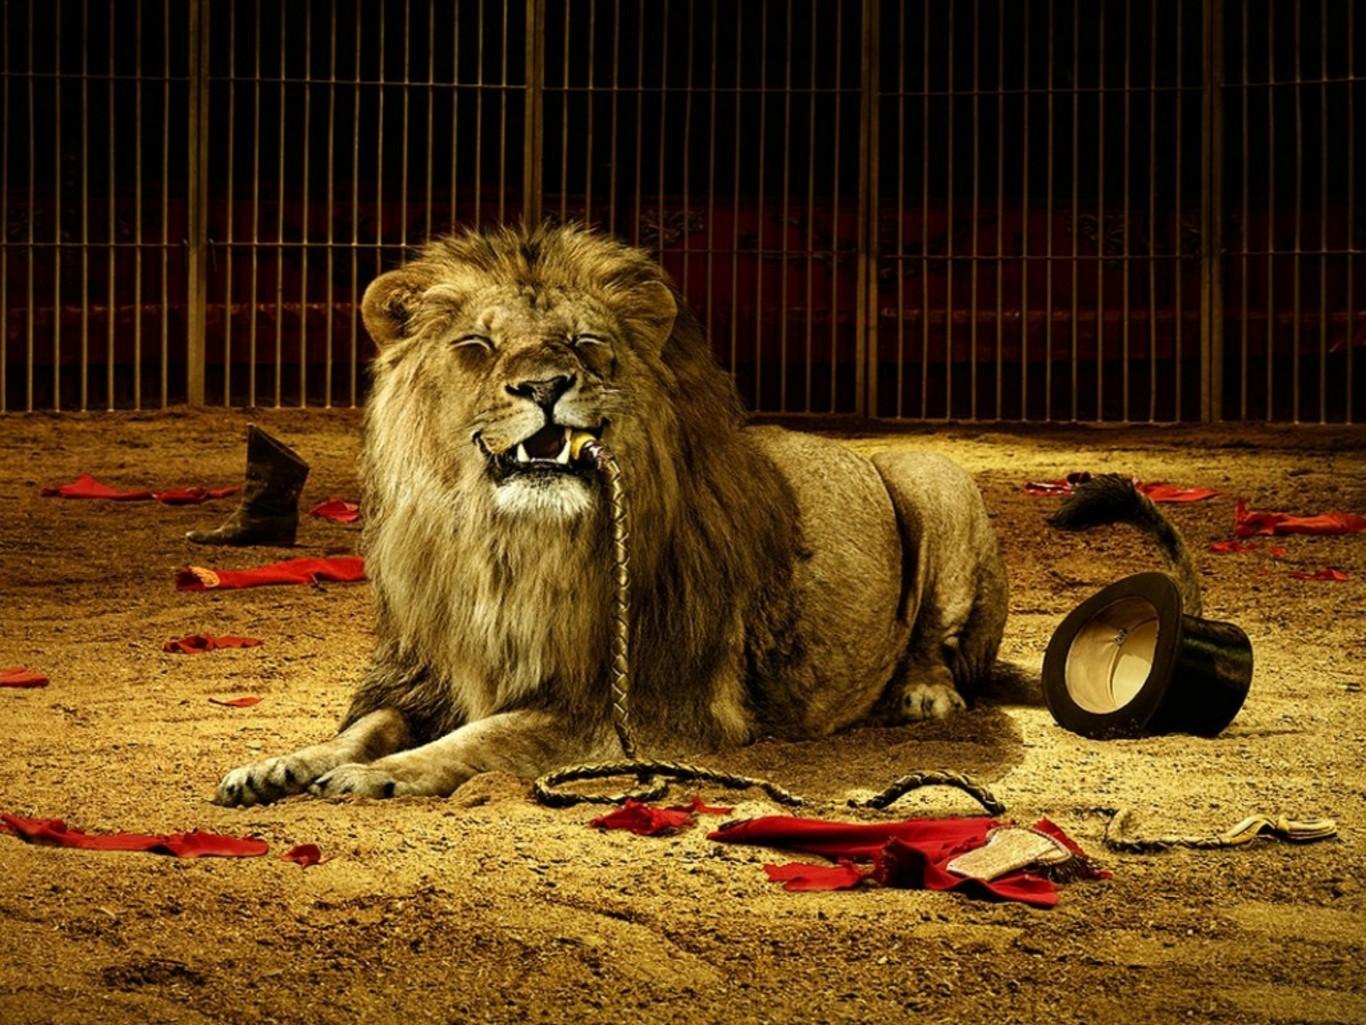 read more male lion info